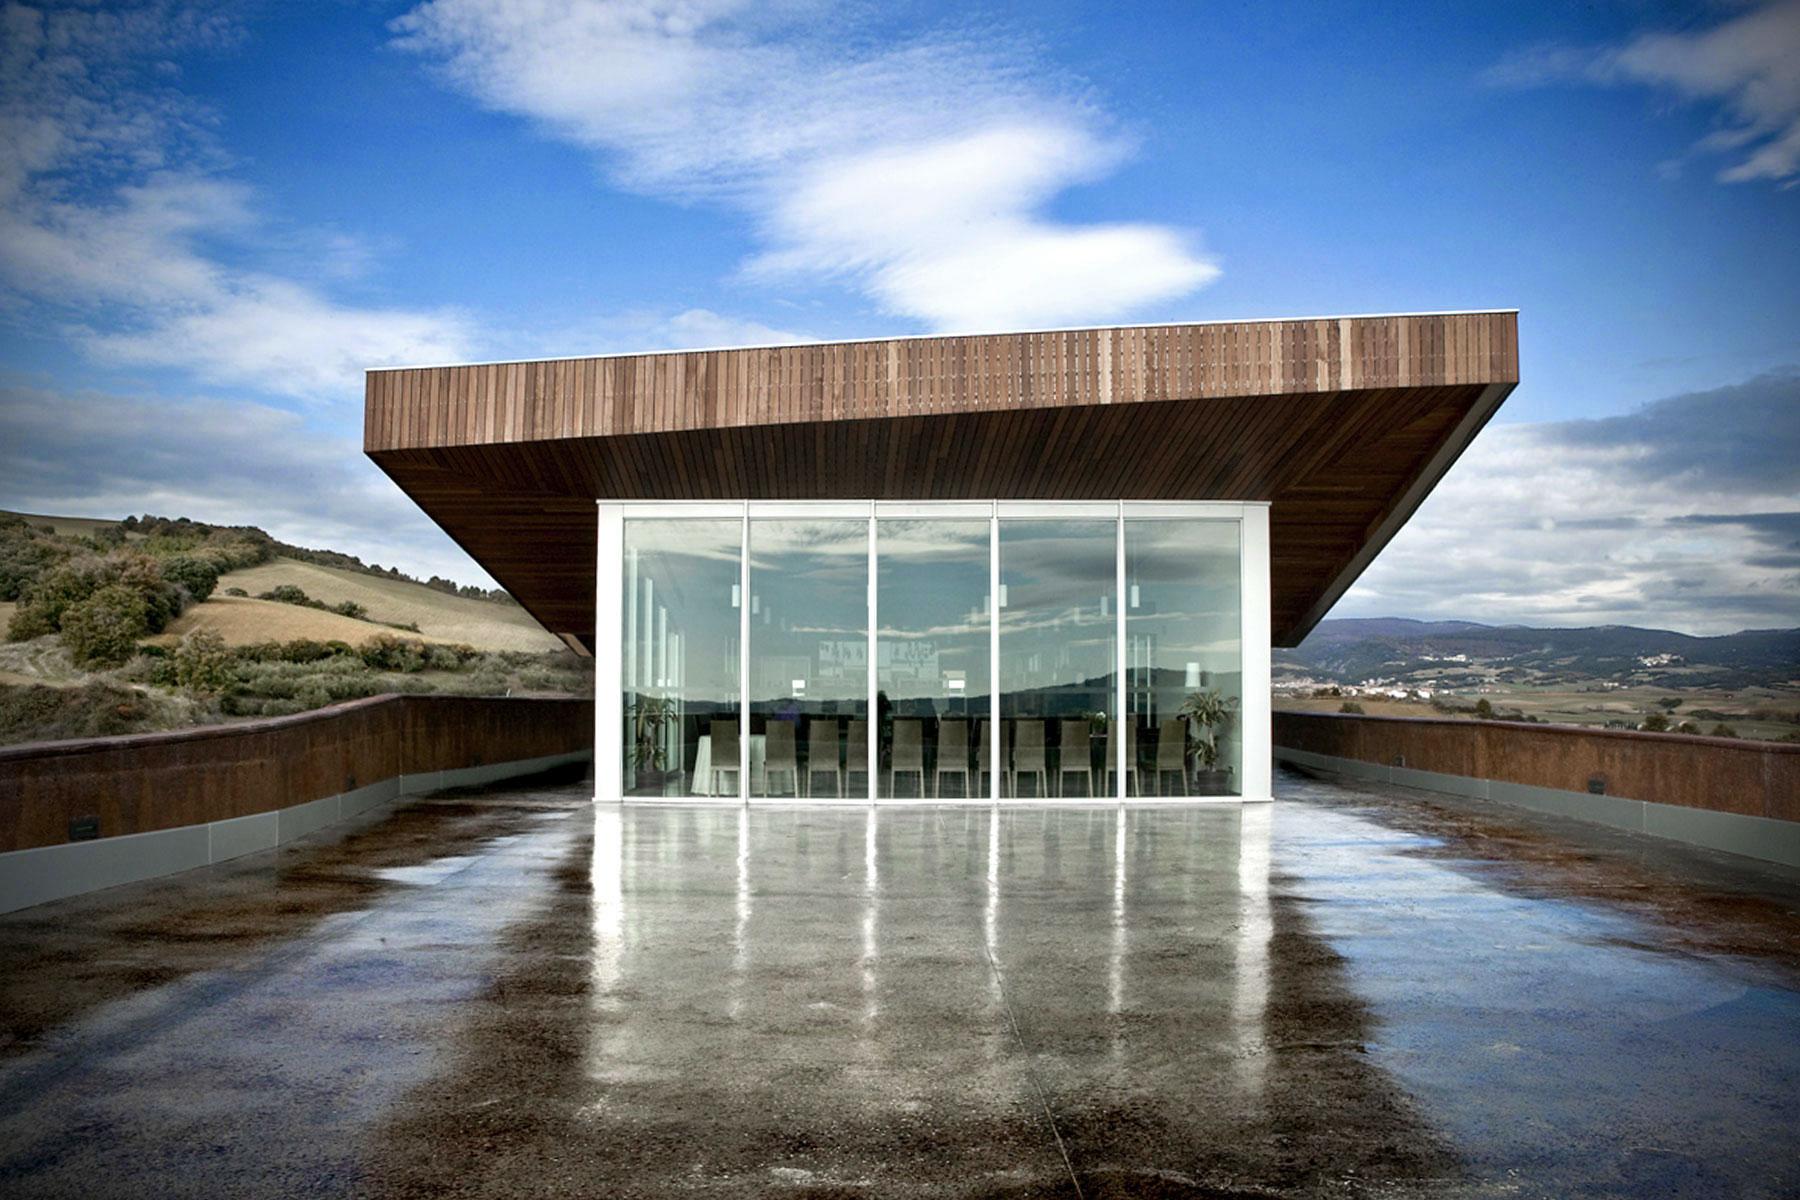 Lider en venta de vinos de Bodega Aroa